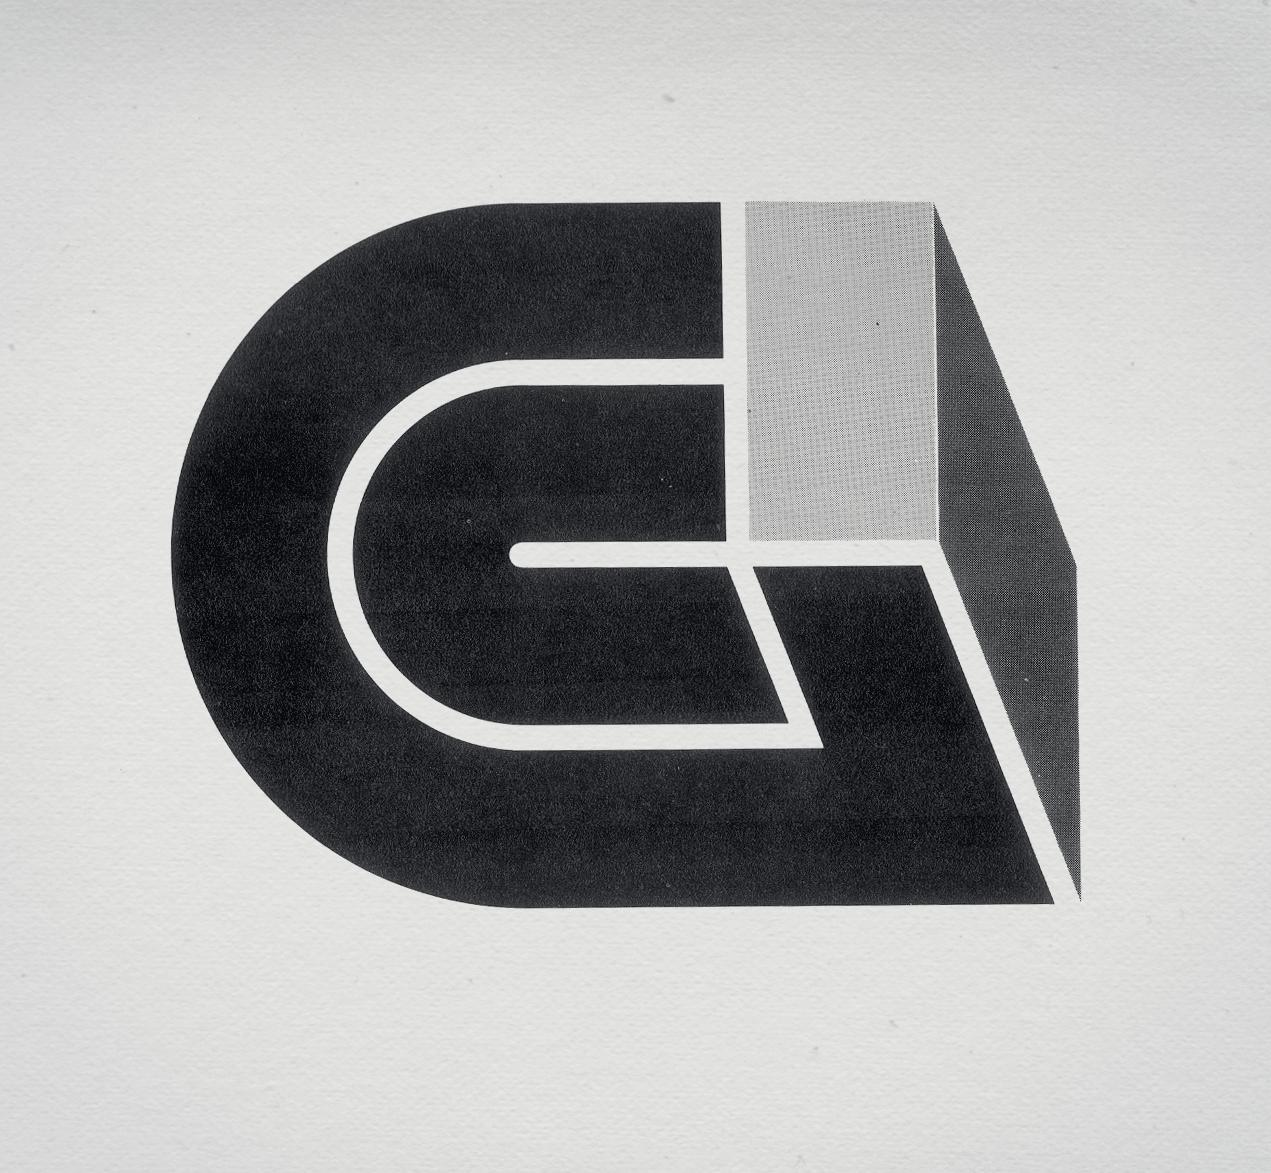 Retro Corporate Logo Goodness_00098 | Flickr - Photo Sharing!